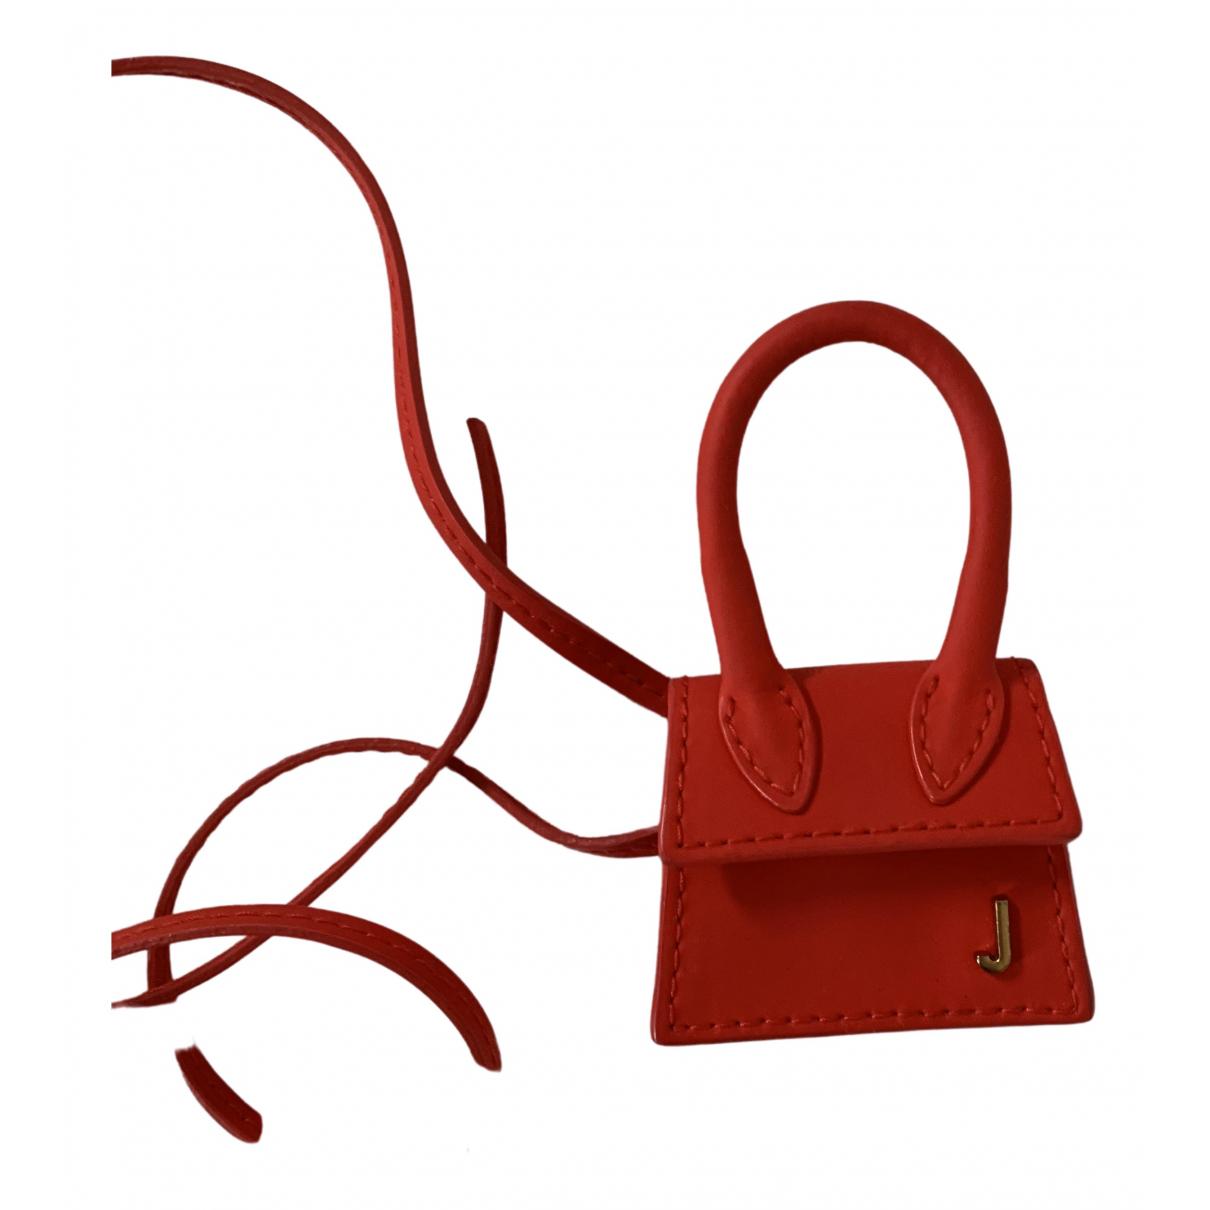 Jacquemus Le Petit Chiquito Handtasche in  Rot Leder